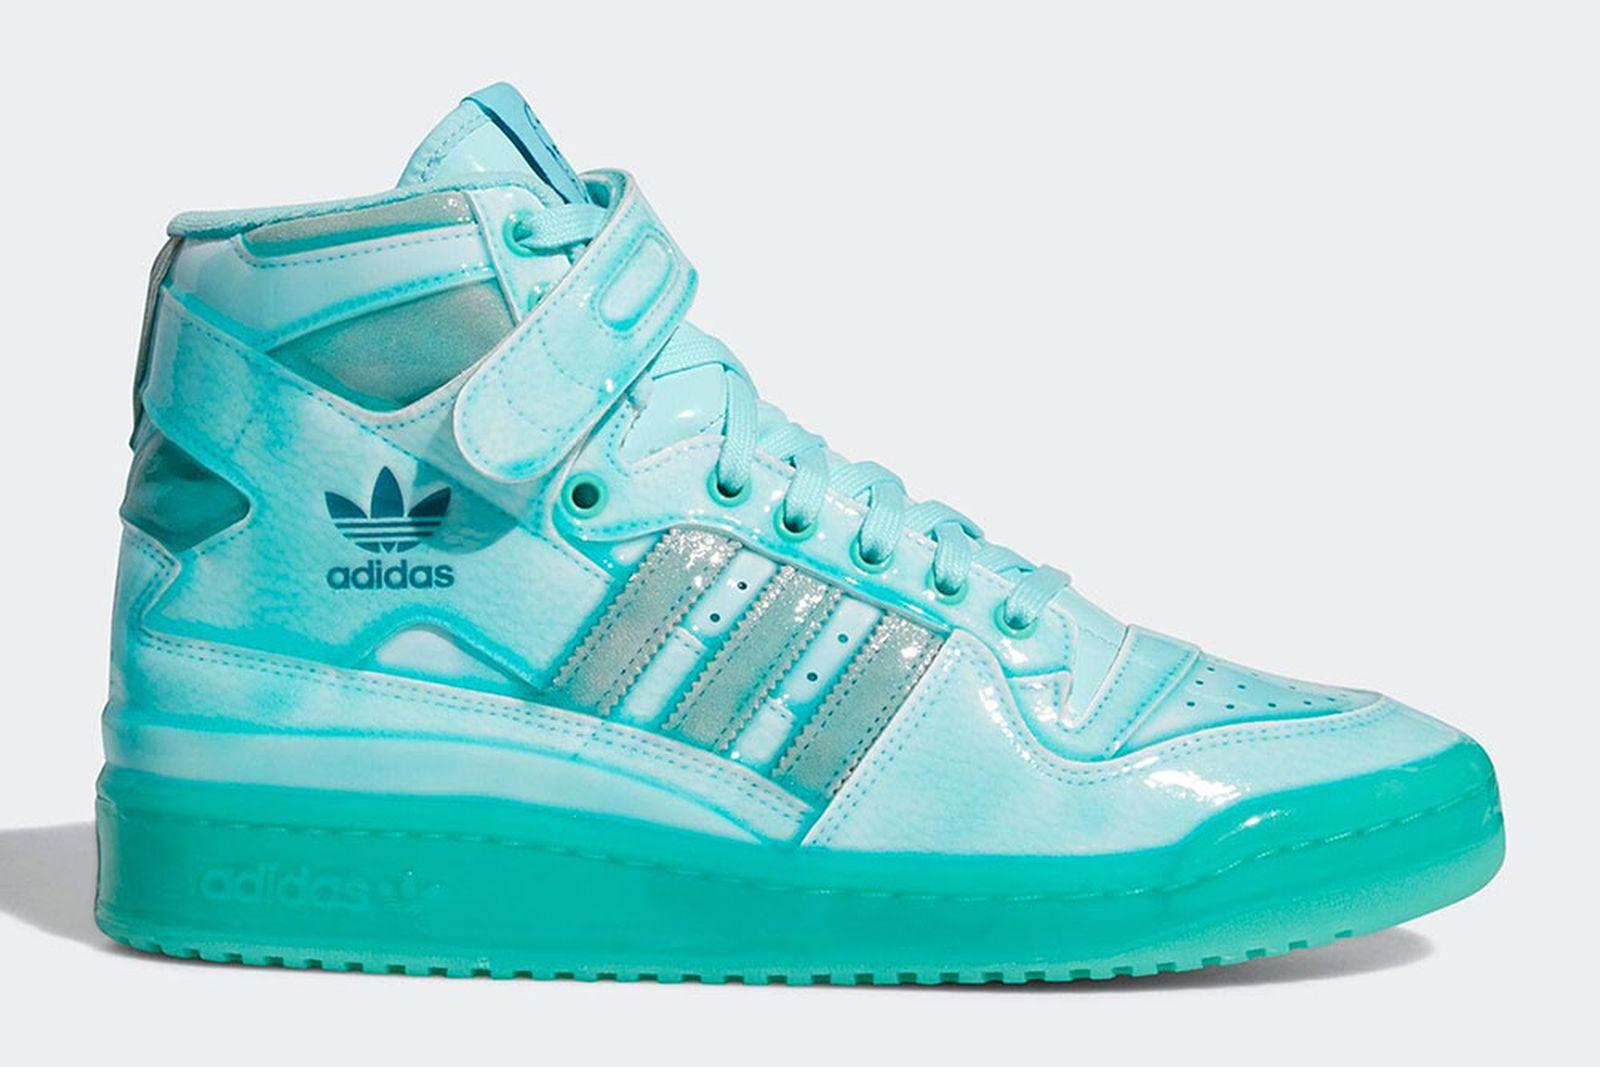 jeremy-scott-adidas-forum-hi-release-date-price-02